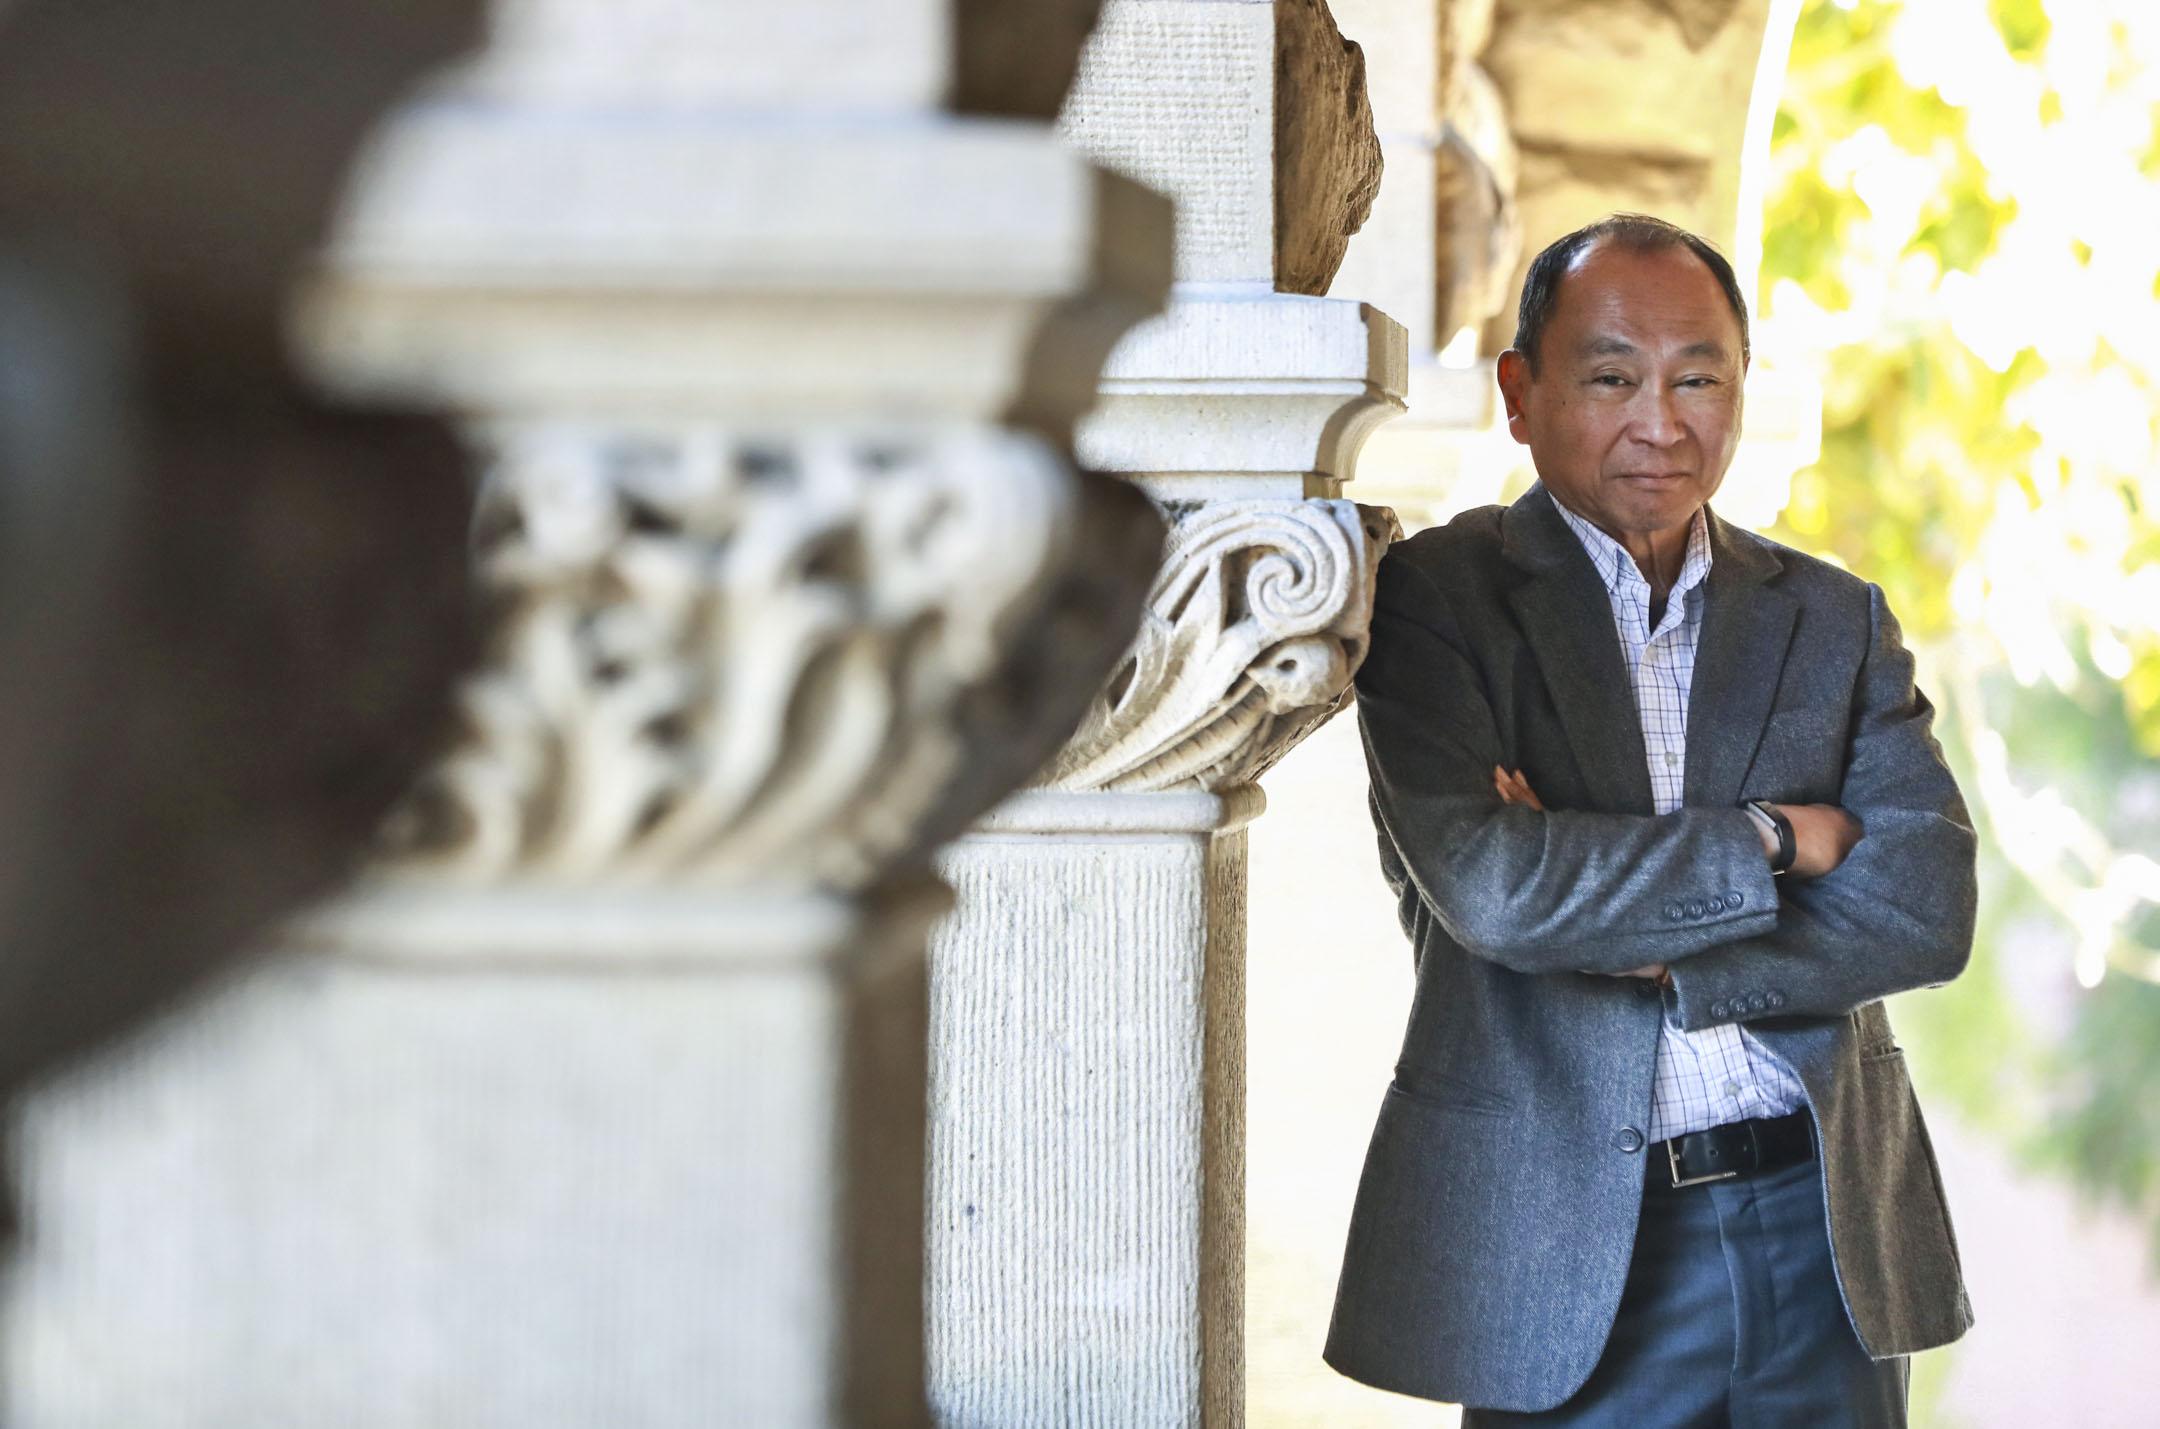 弗朗西斯·福山(Francis Fukuyama),美國作家、政治經濟學者。最新著作《身份認同:對尊嚴的要求以及憤懣的政治(Identity: the Demand for Dignity and the Politics of Resentment)》剛於2018年九月在美國出版。 攝:Daisuke Tomita /Imagine China